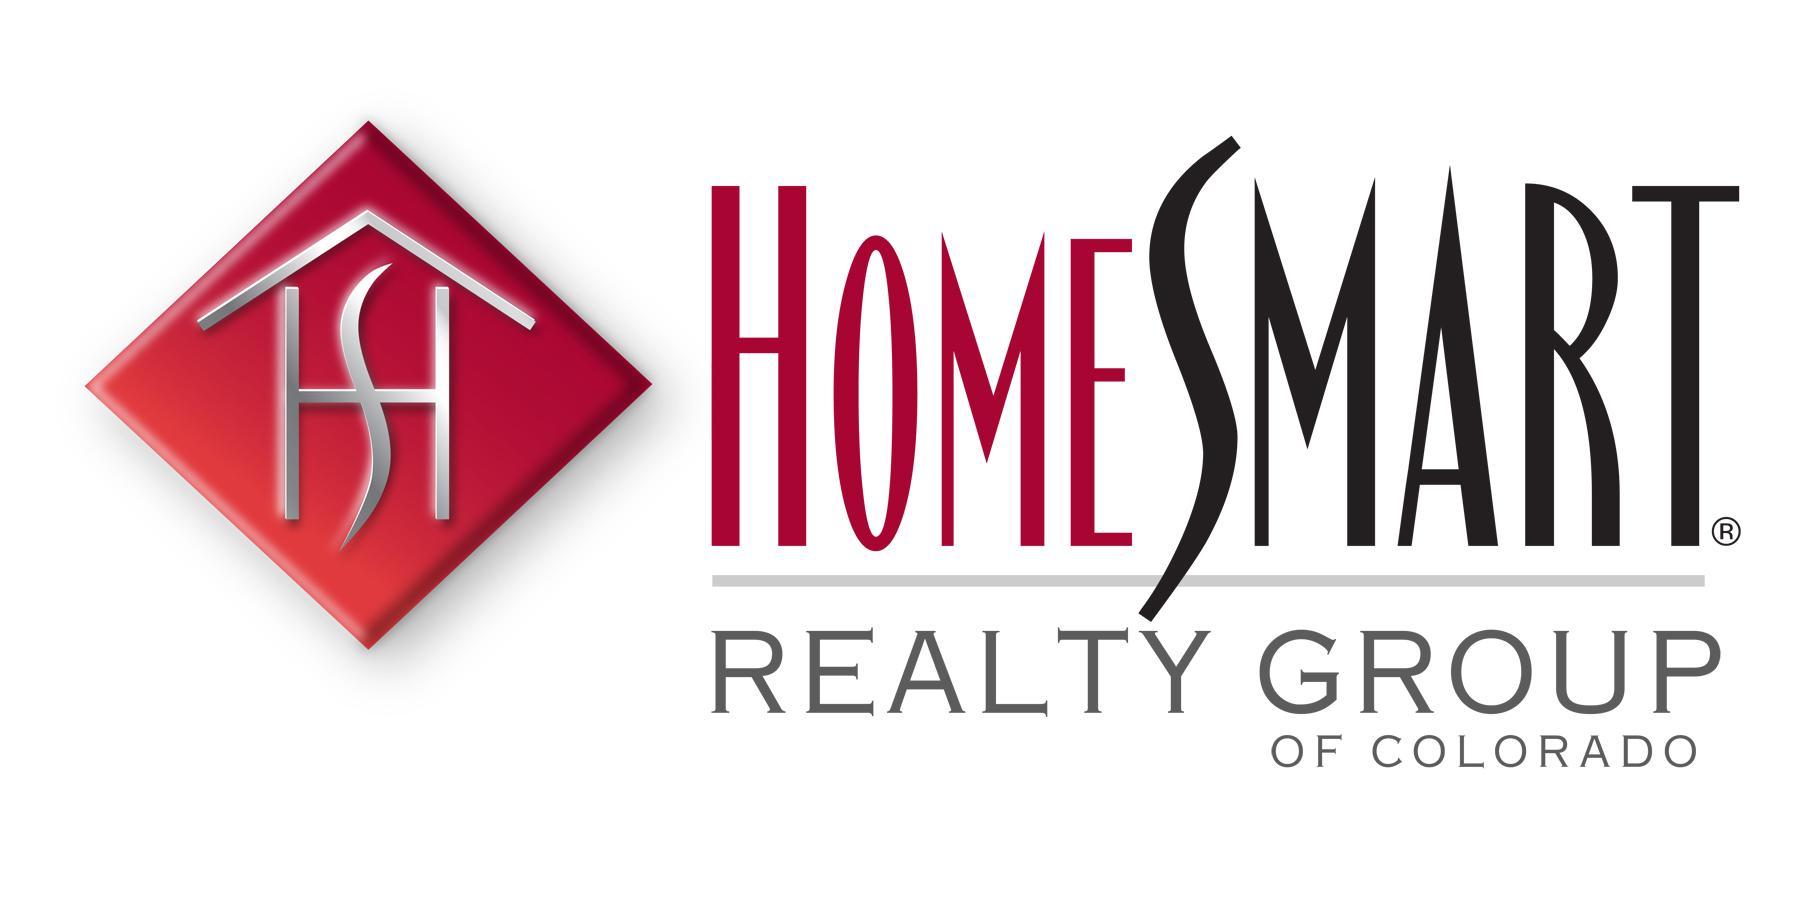 Patrick Murray - Homesmart Realty Group